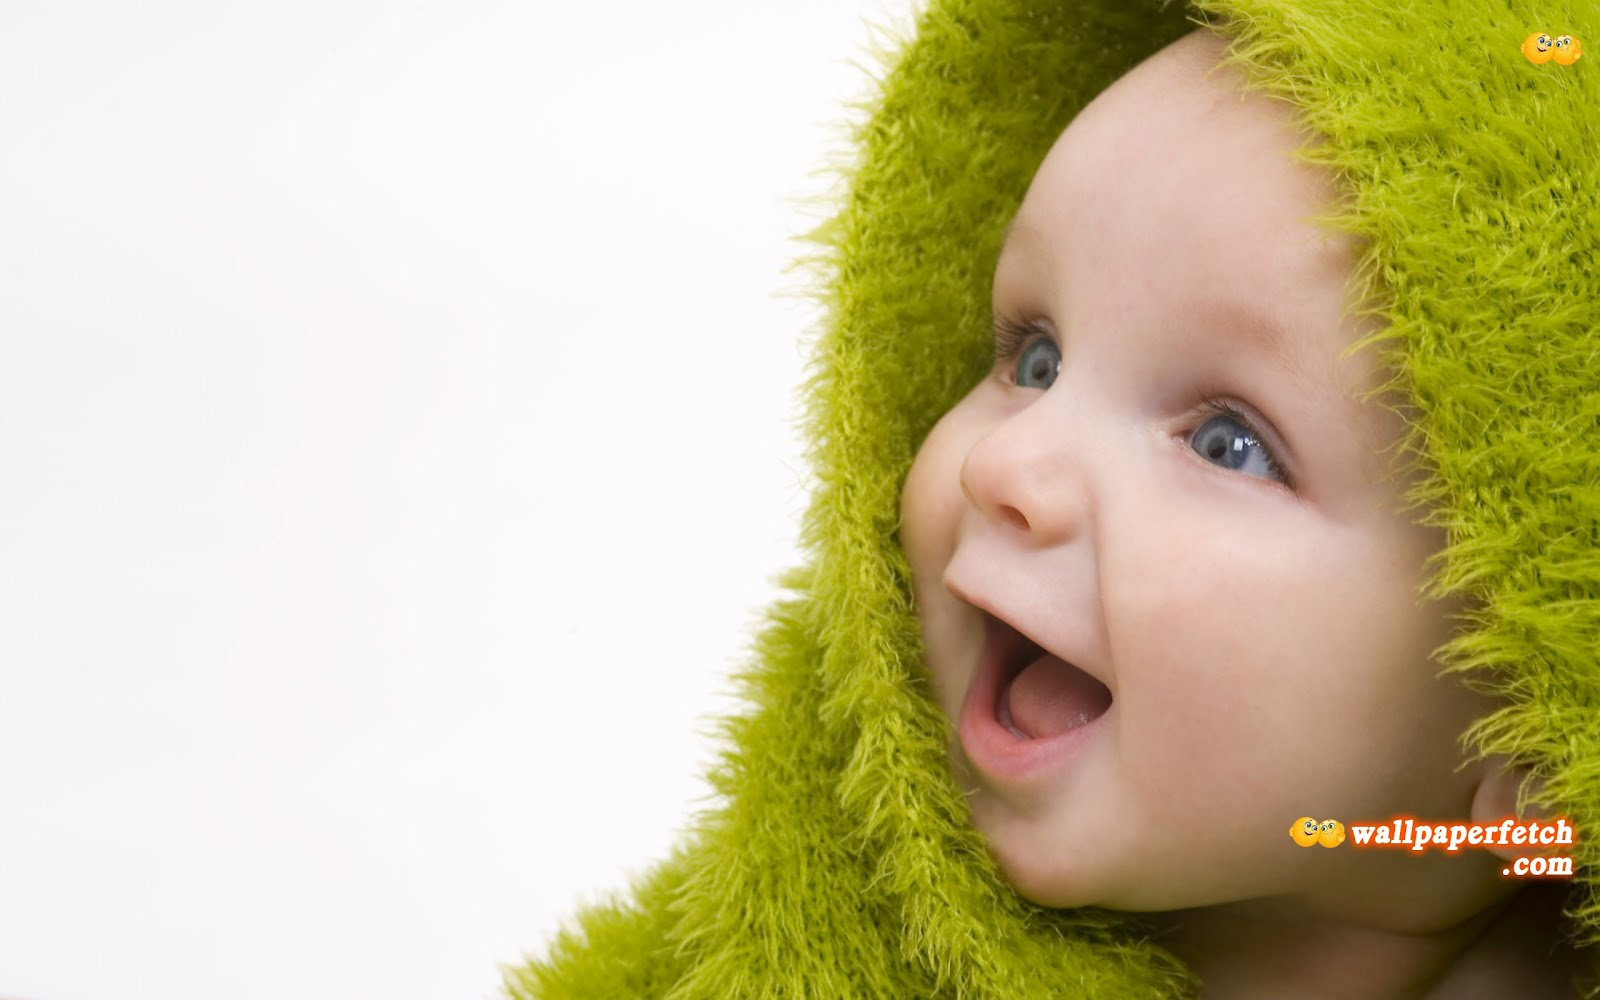 http://1.bp.blogspot.com/-yQ_yf_1M-bE/UAOvwNbnhPI/AAAAAAAAFyc/DYTSMijzSas/s1600/Cute-Baby-Wallpaper.jpg